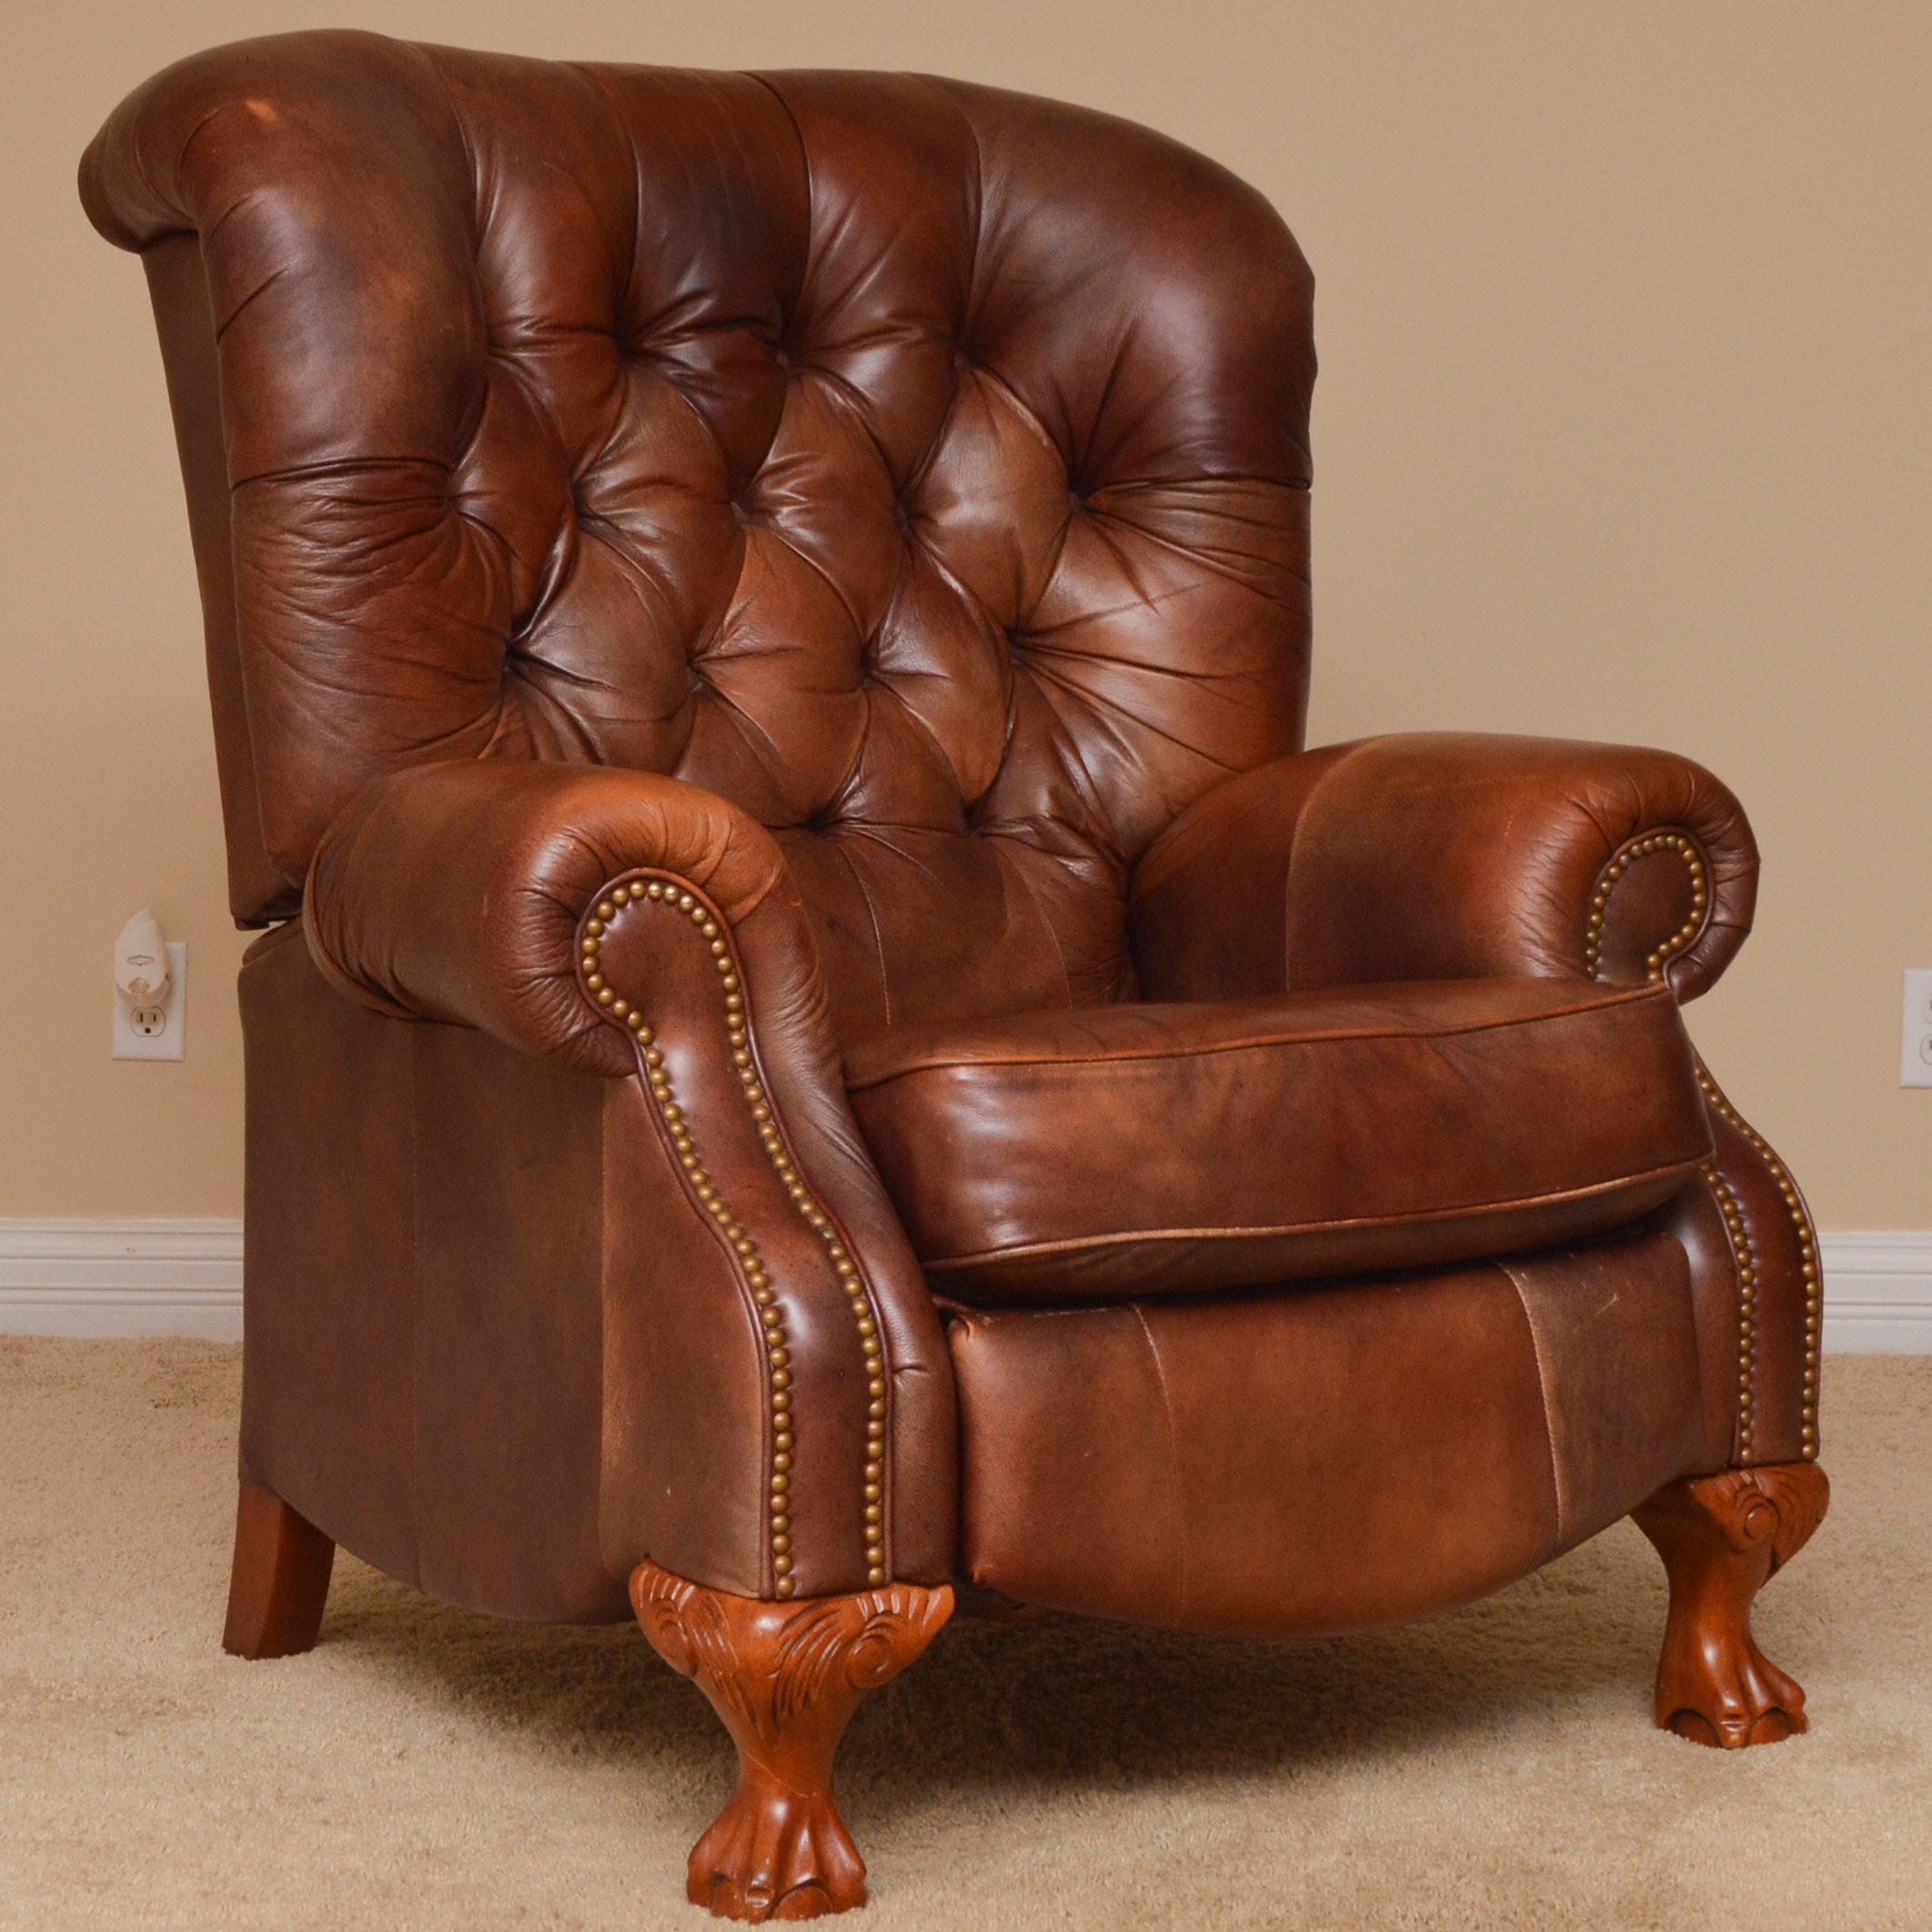 La-Z-Boy Brown Leather Recliner